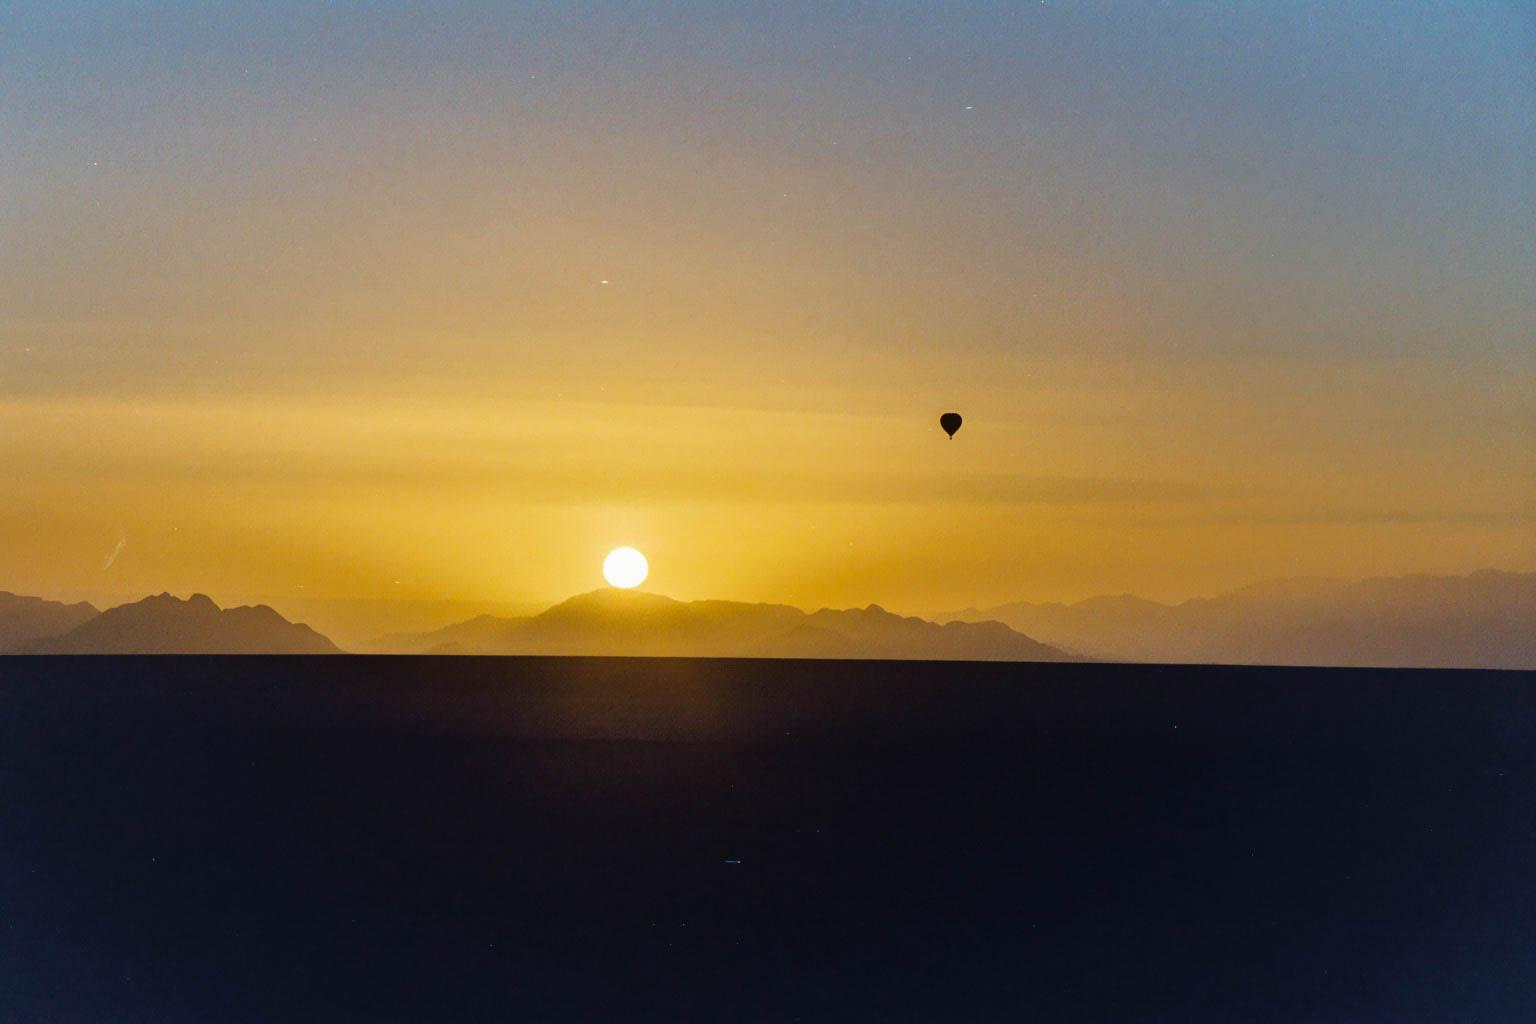 Hot air balloon at sunrise, Namibia